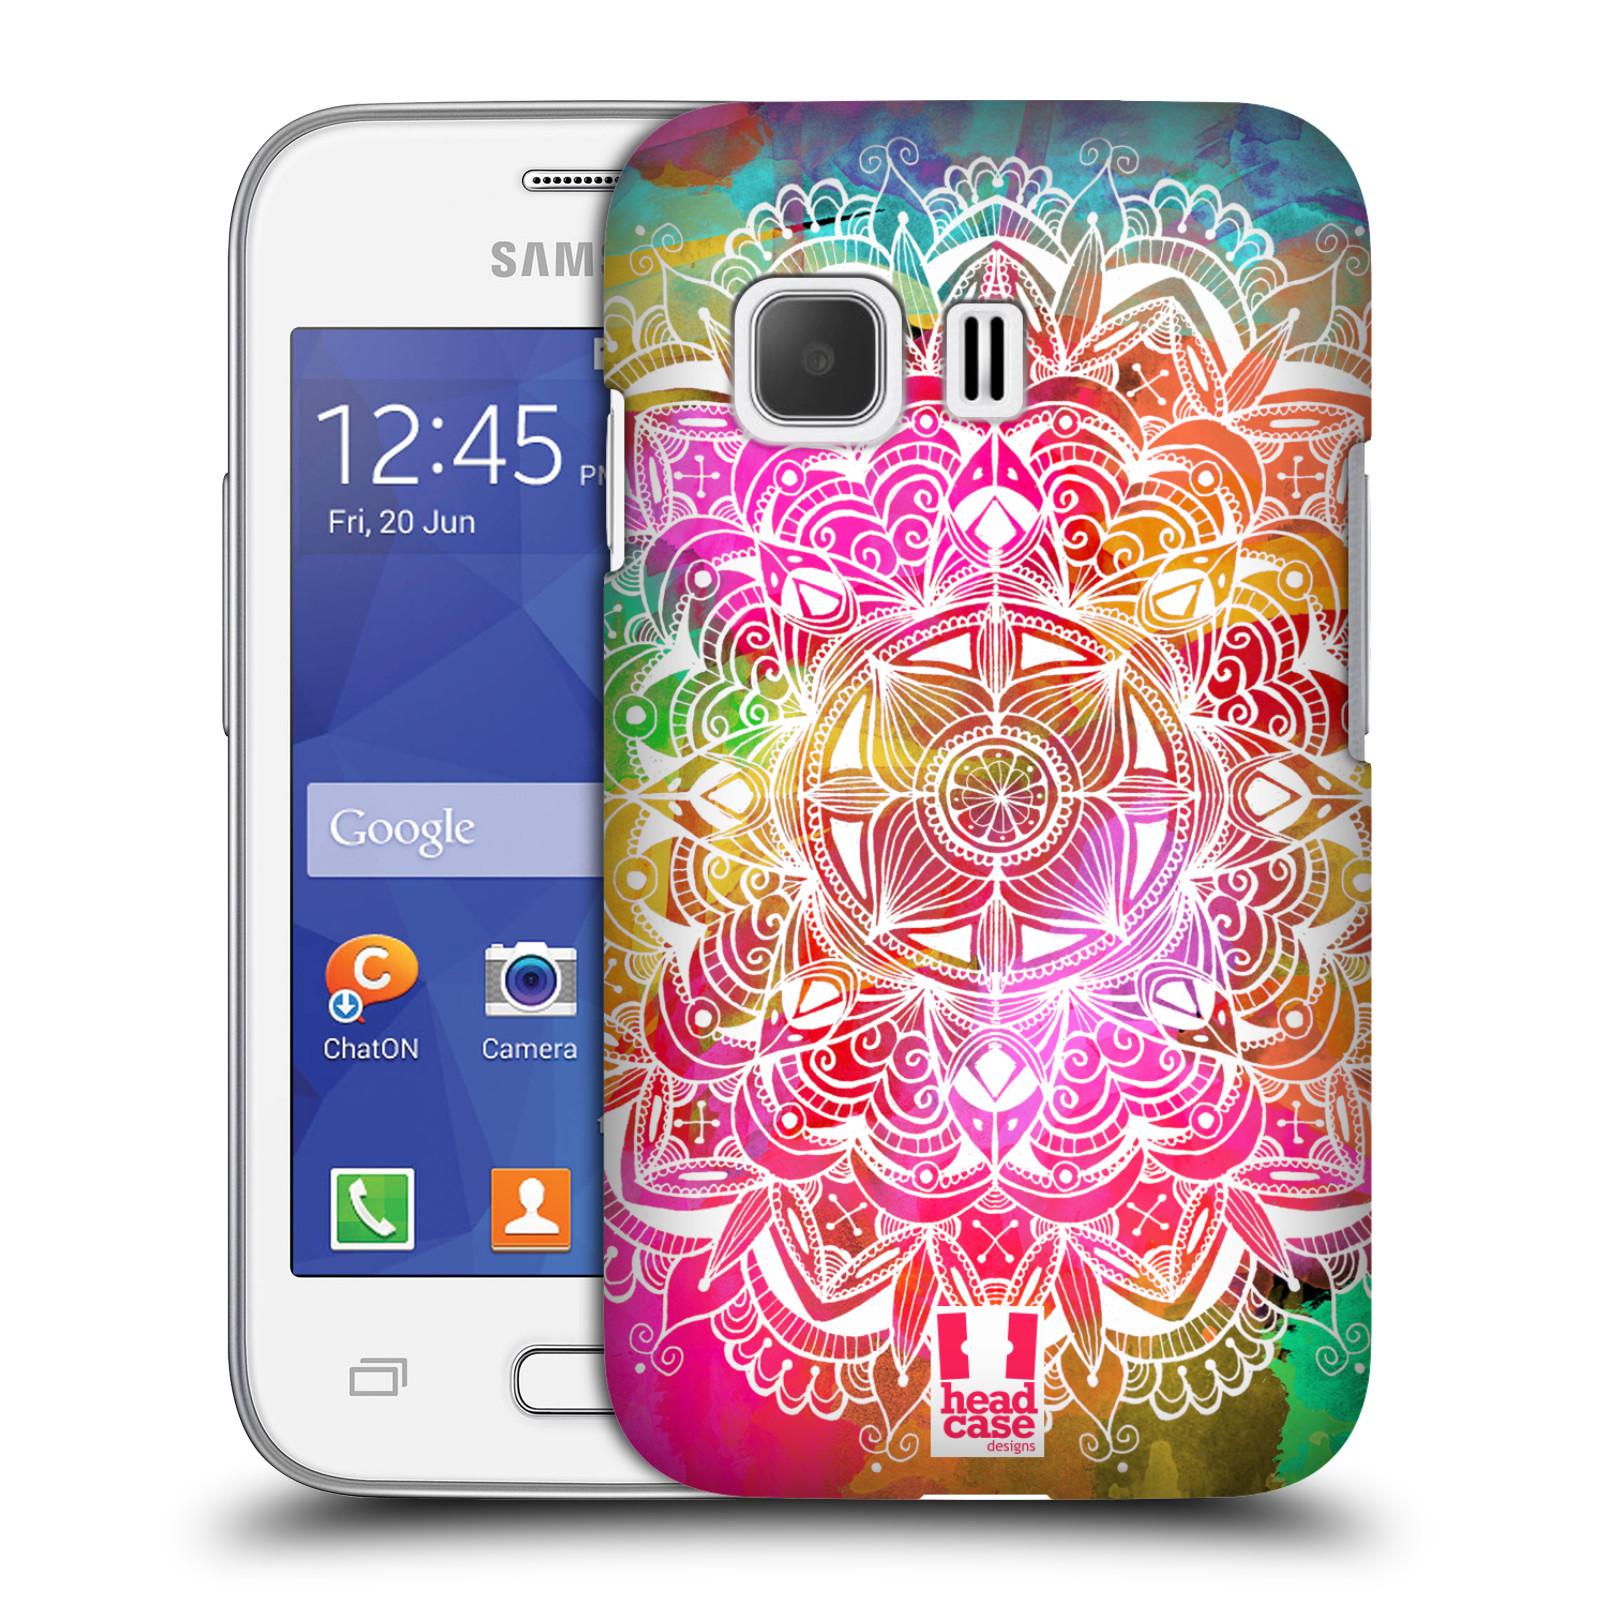 Plastové pouzdro na mobil Samsung Galaxy Young 2 HEAD CASE Mandala Doodle Watercolour (Kryt či obal na mobilní telefon Samsung Galaxy Young 2 SM-G130)